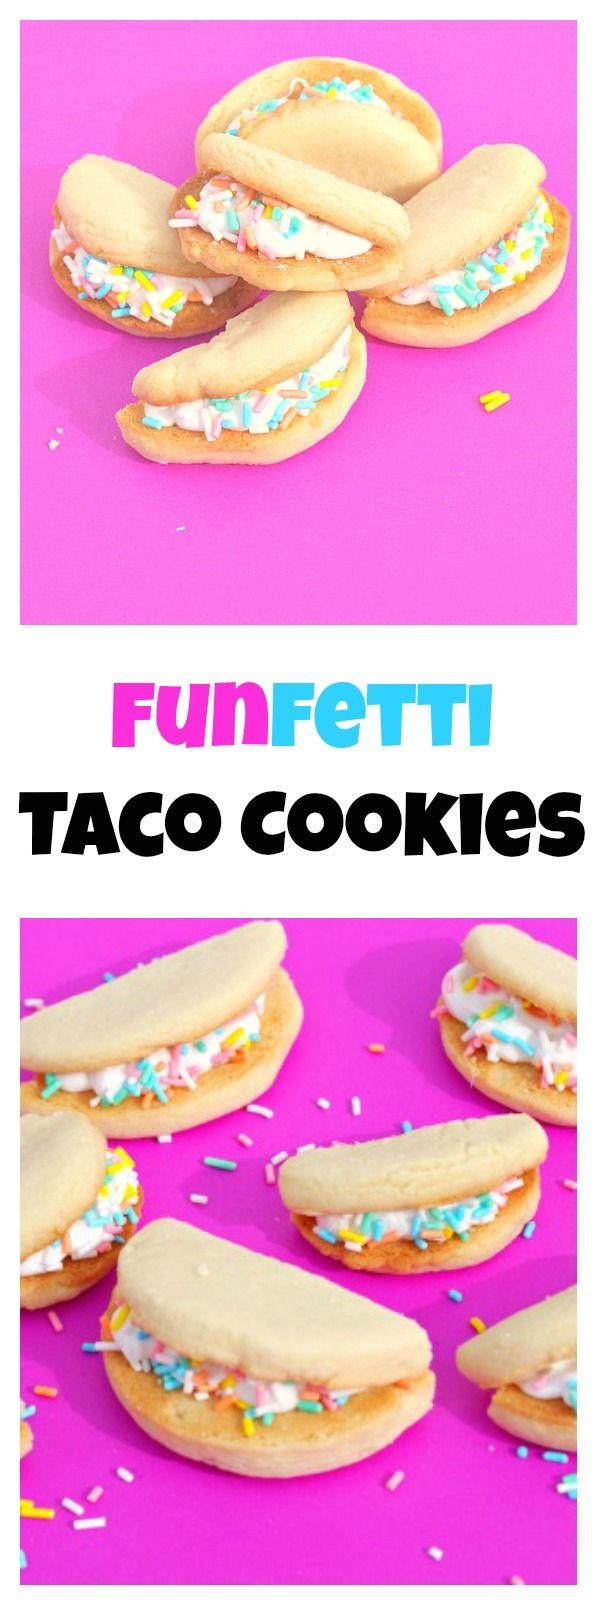 Funfetti Taco Cookies